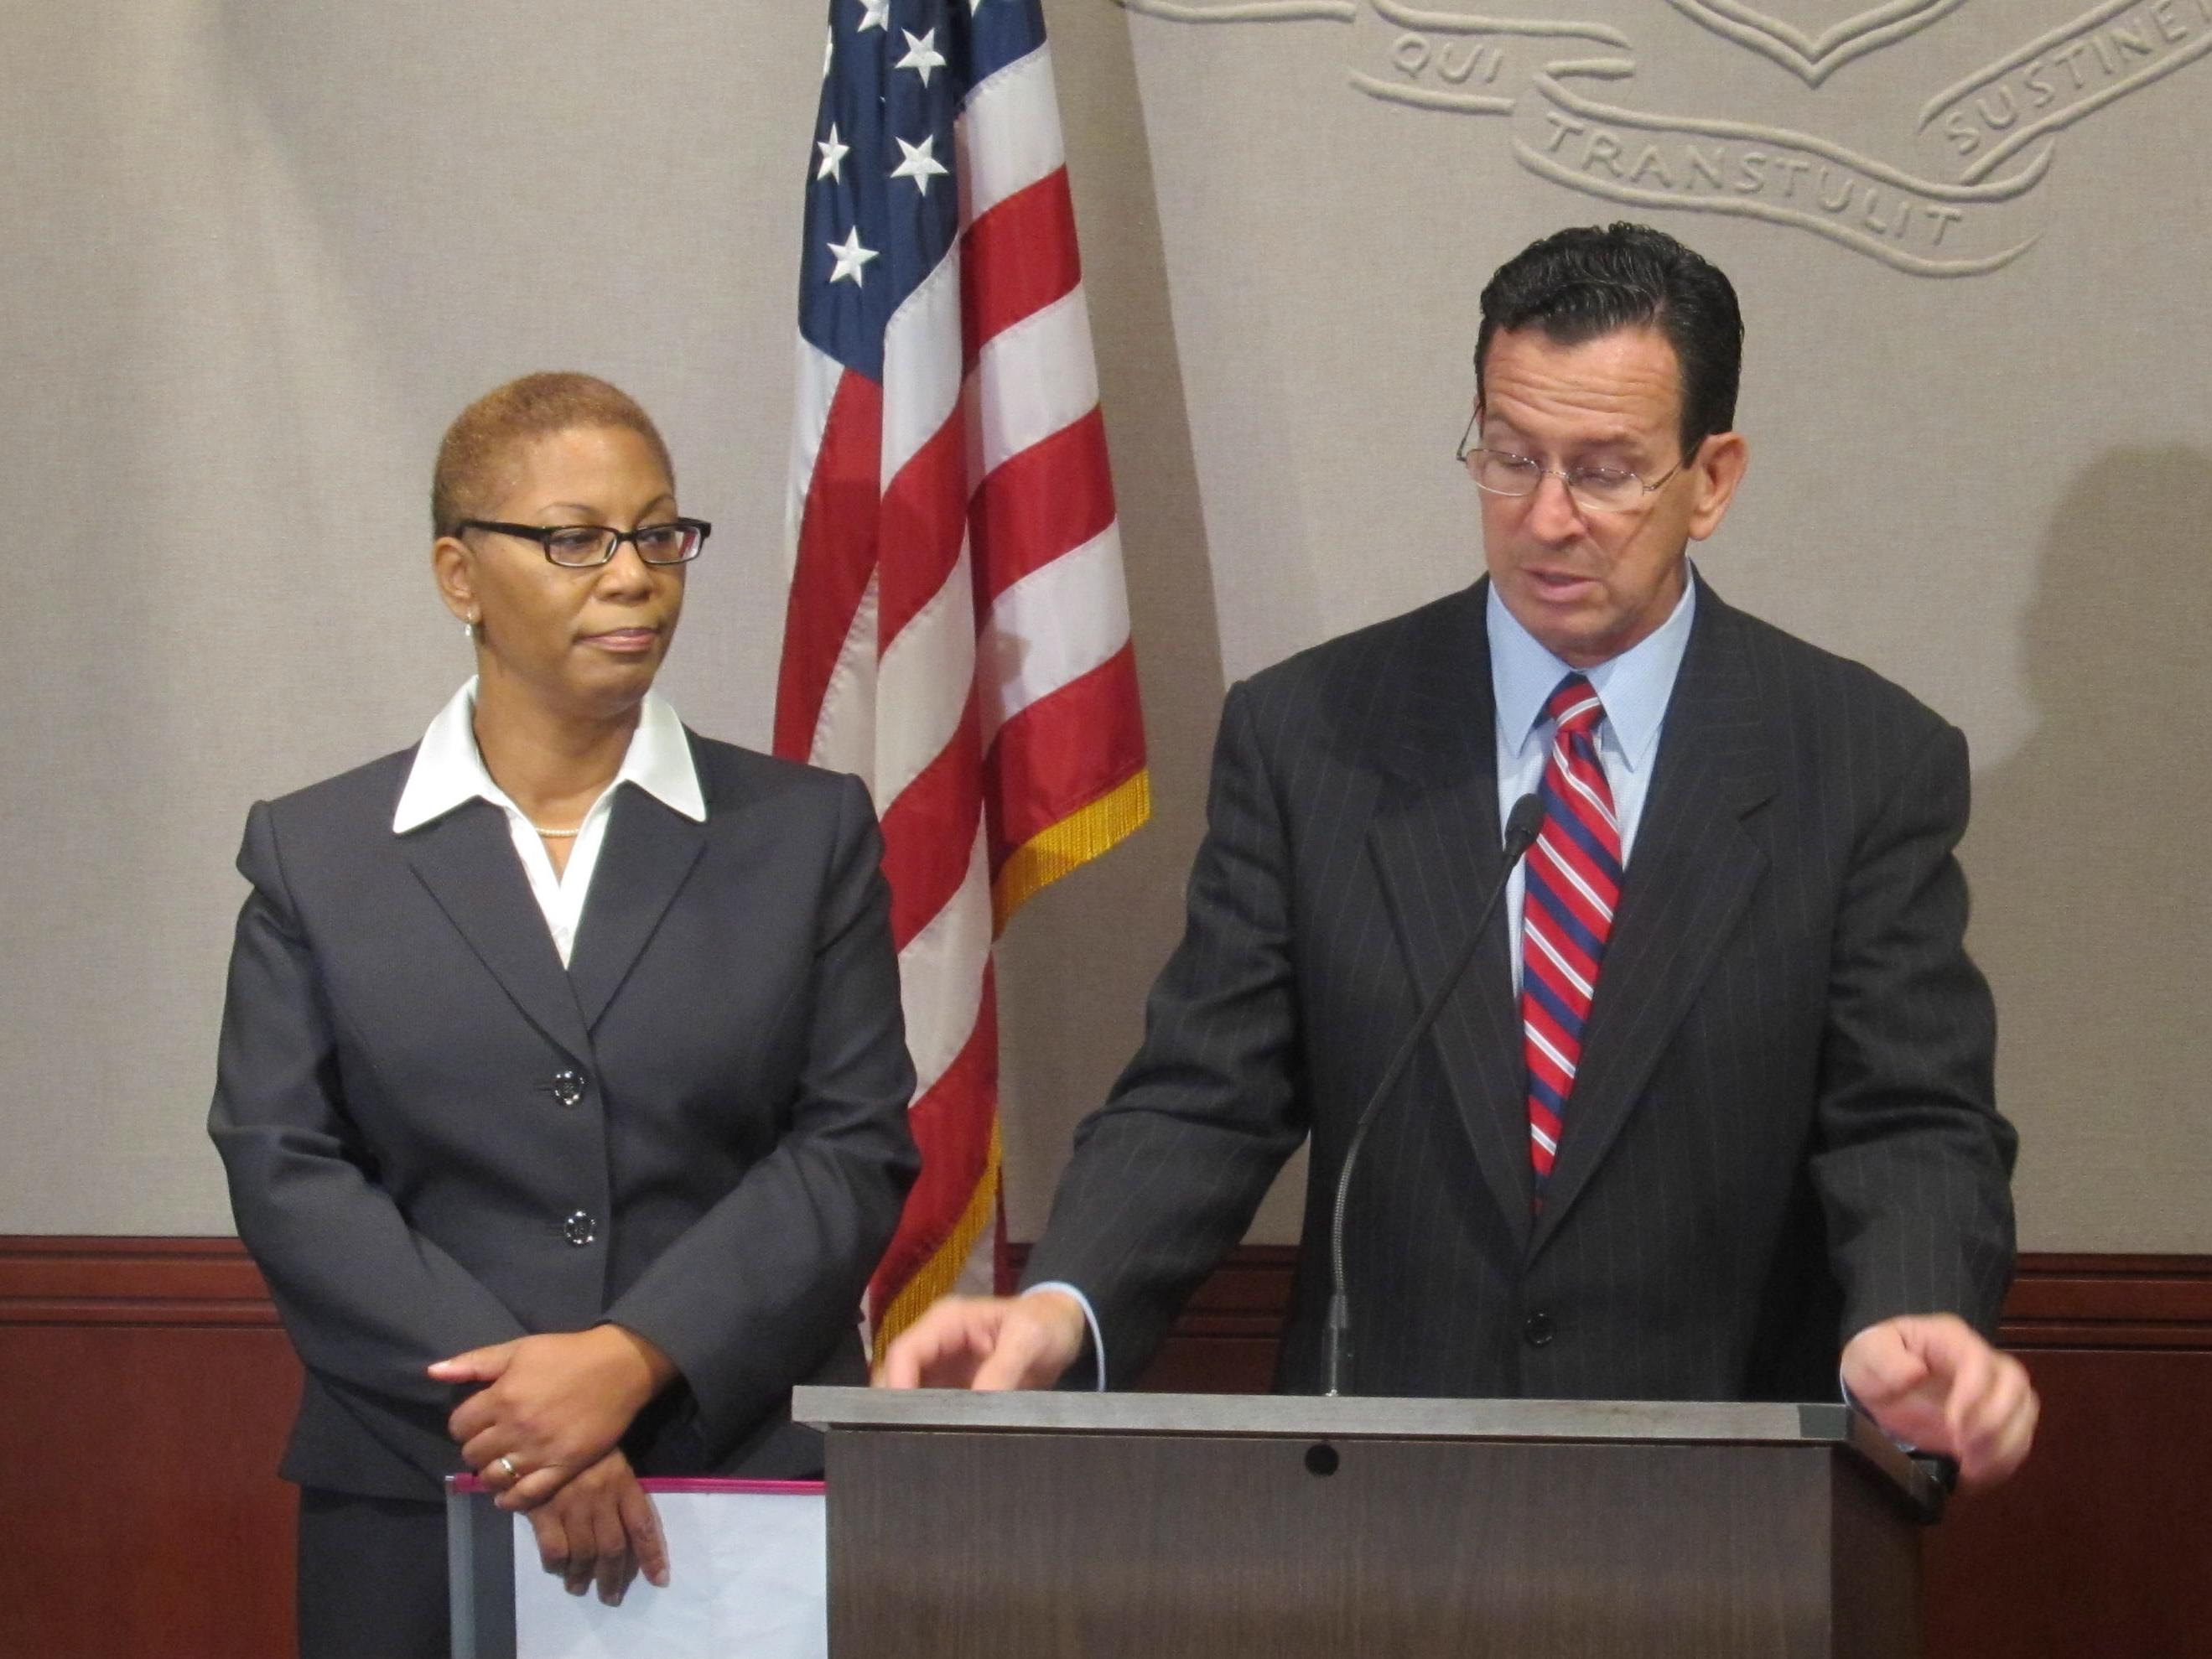 Under Malloy, a more diverse judiciary